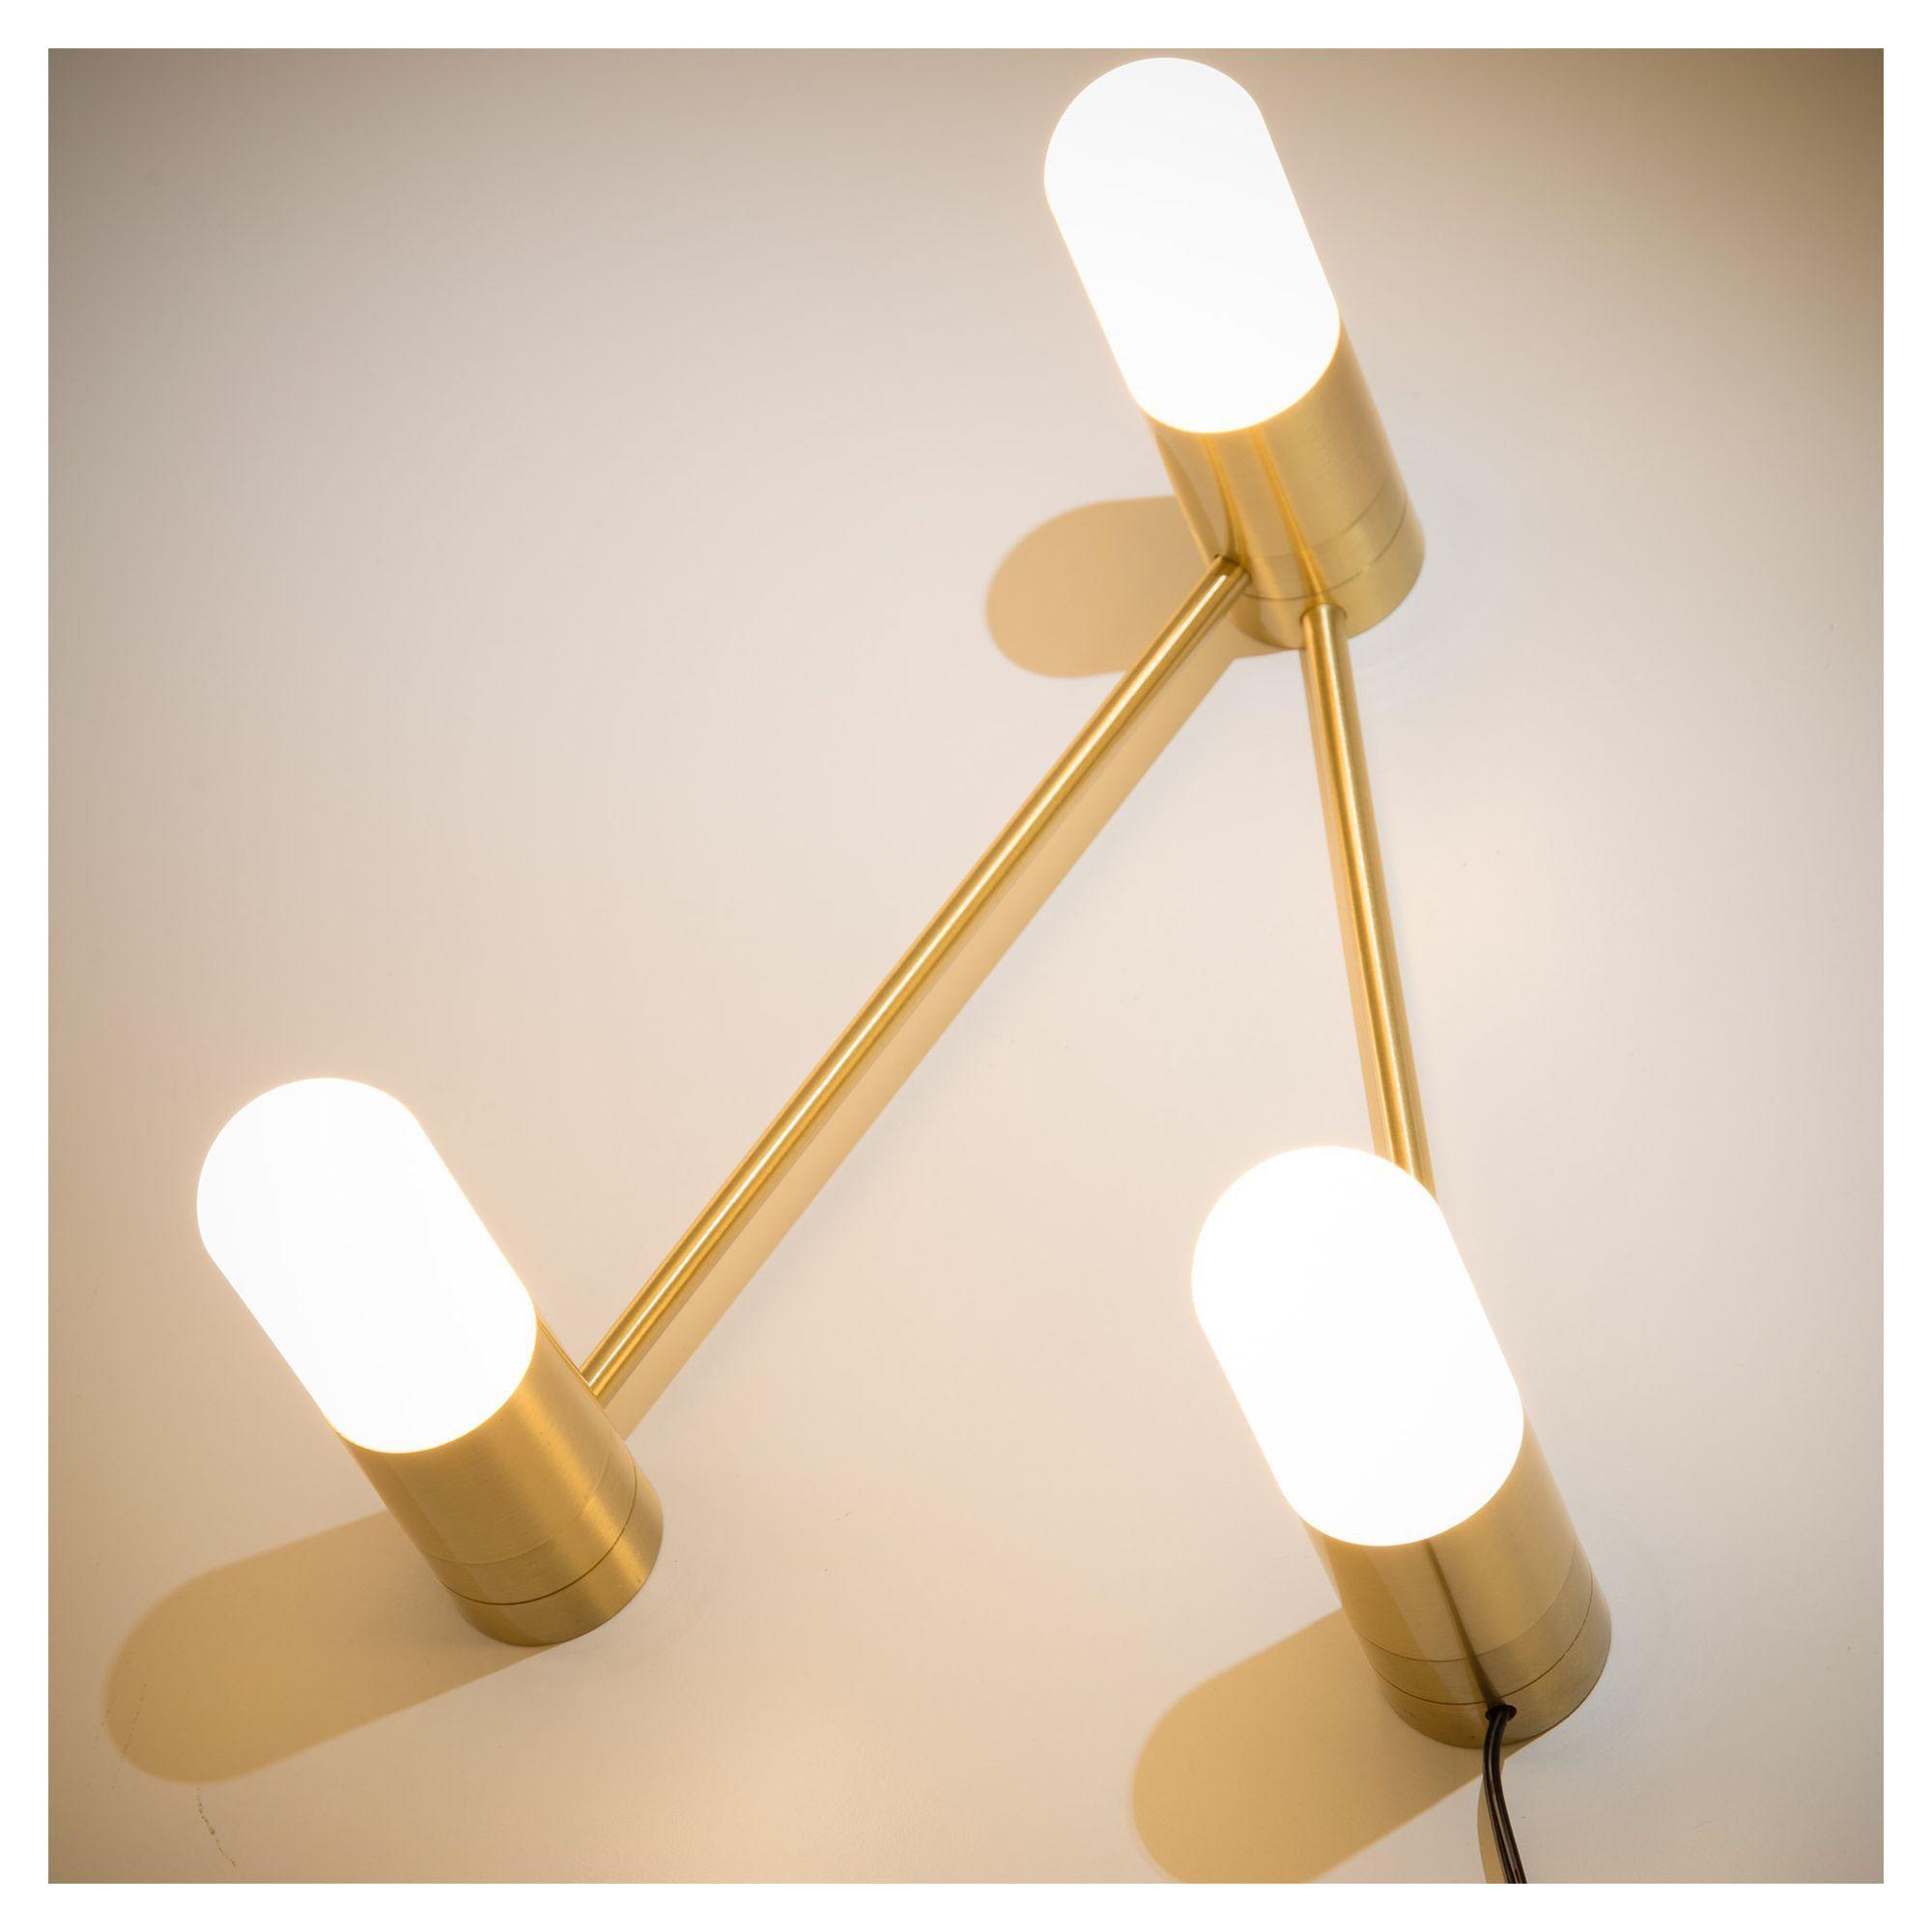 LaForma Badra Bord- eller Væglampe - Gylden